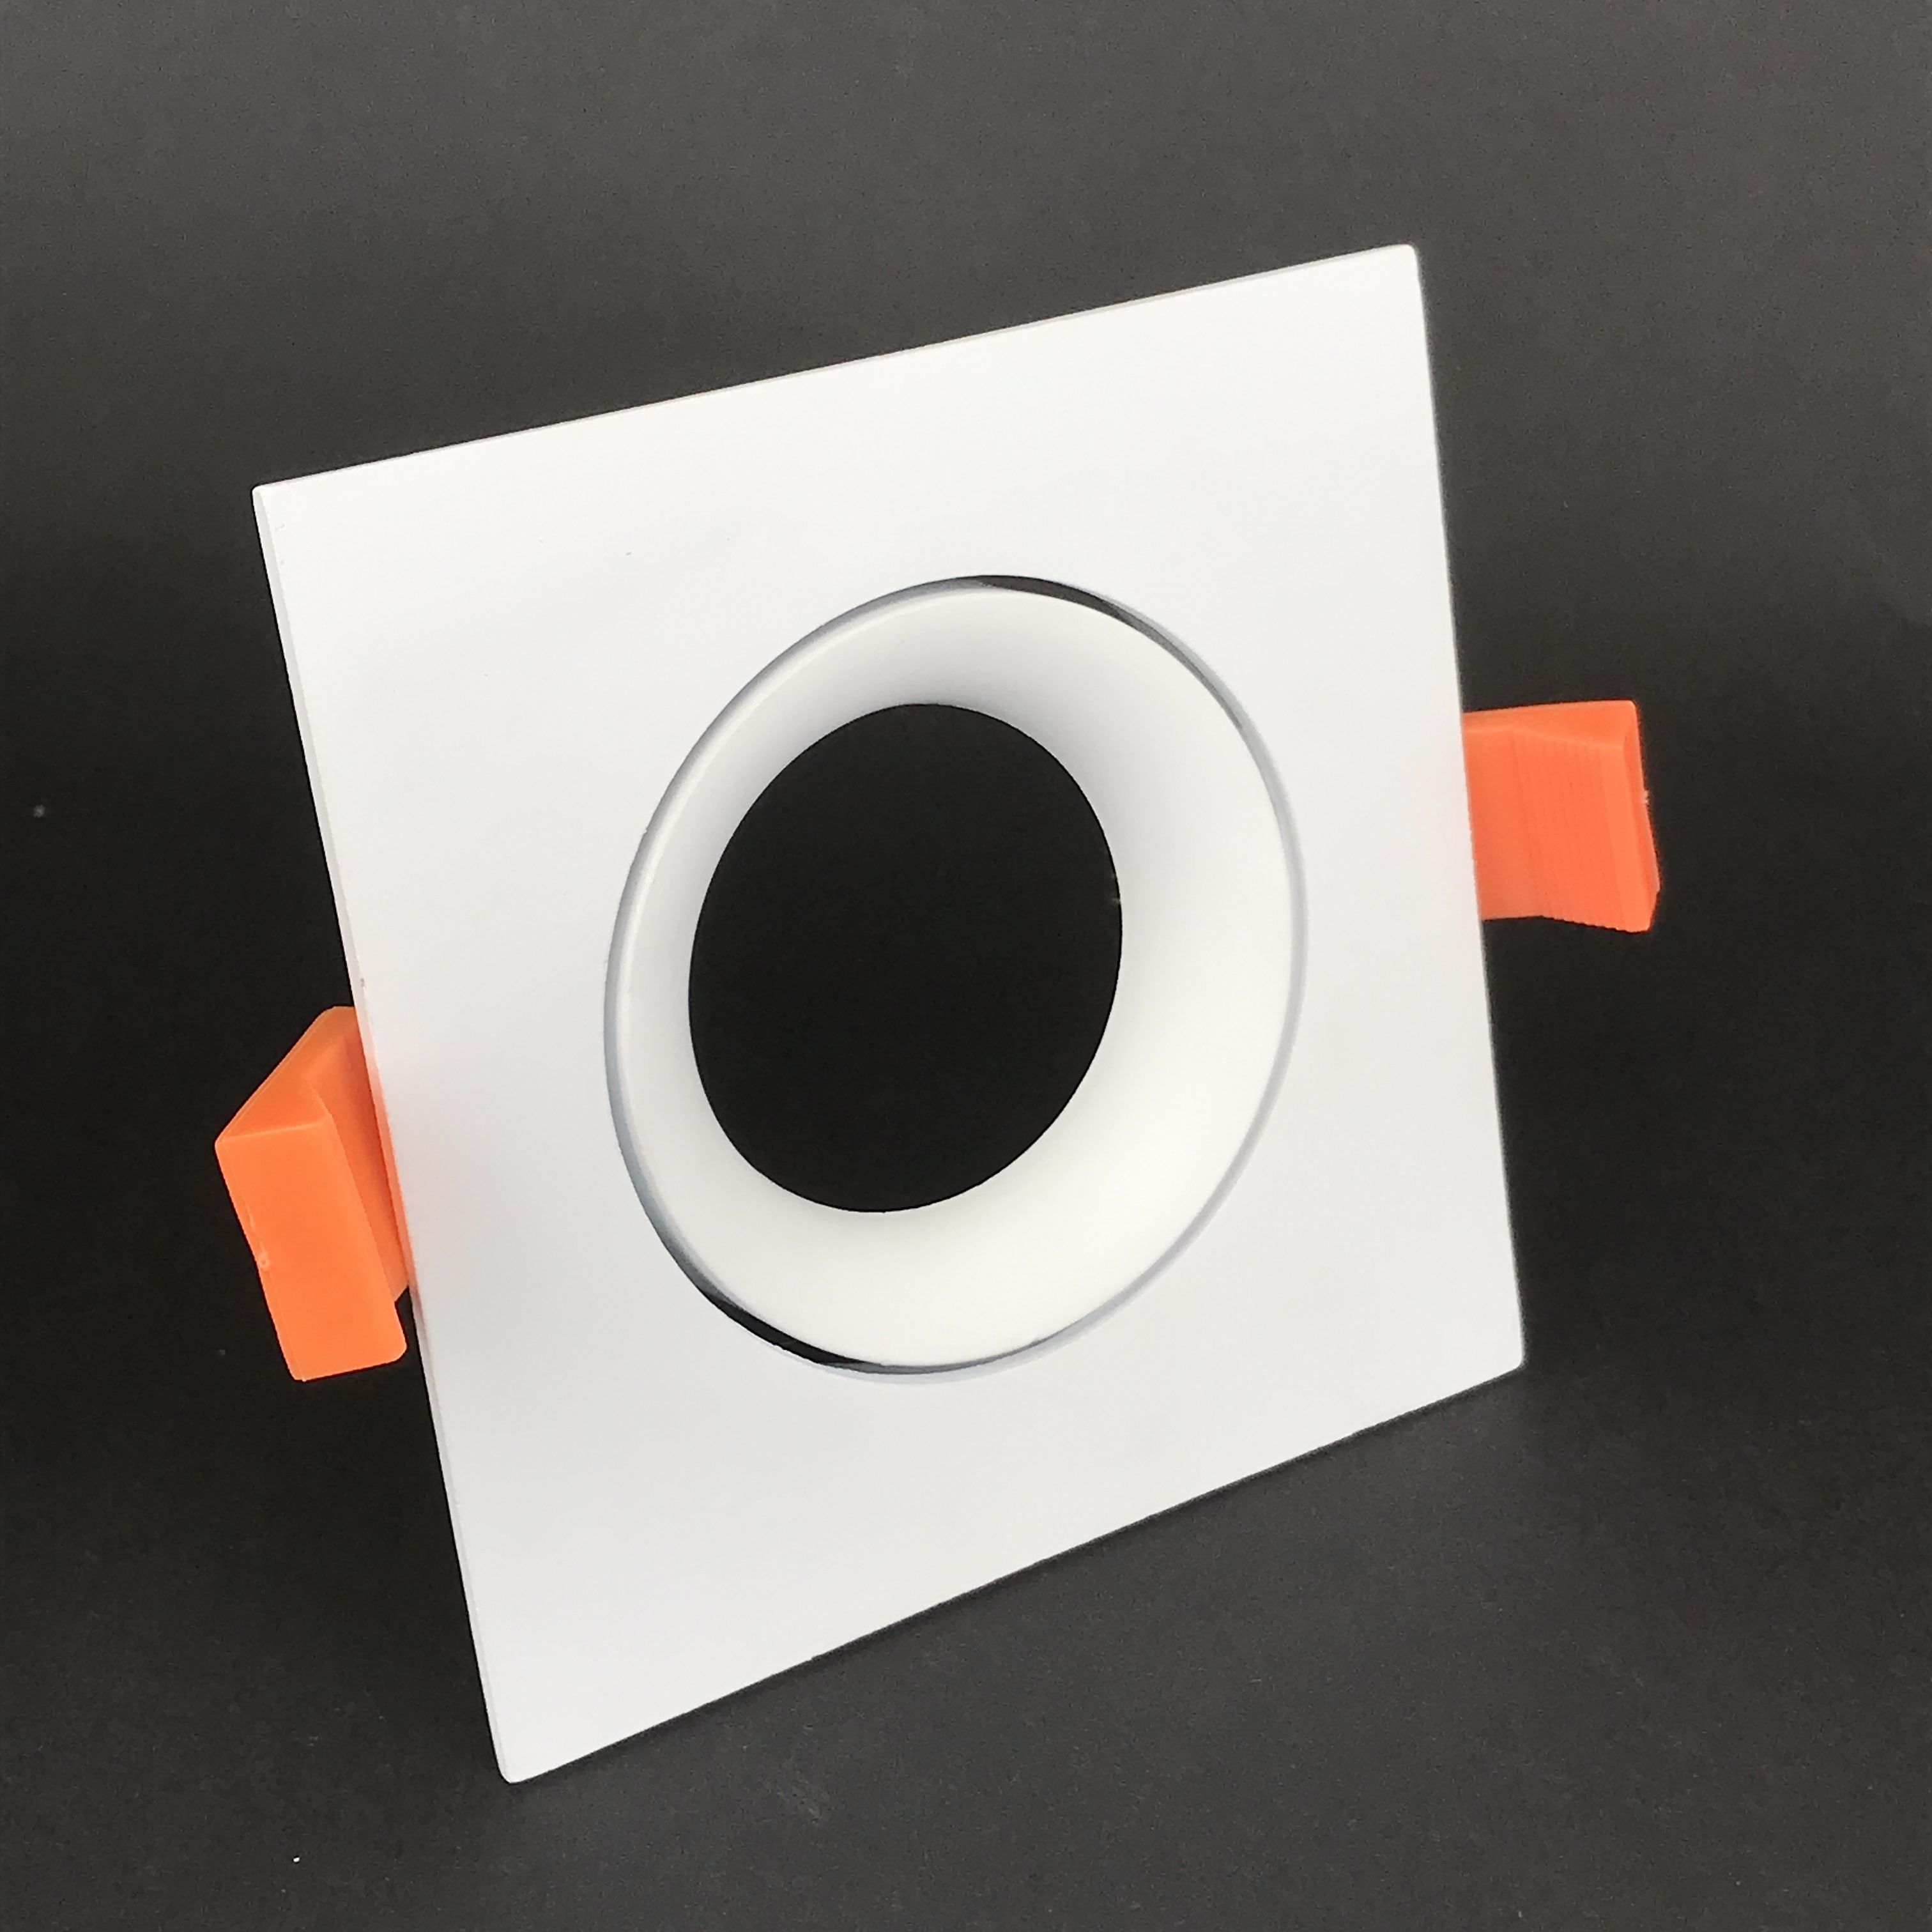 Inbouwring 95mm vierkant wit